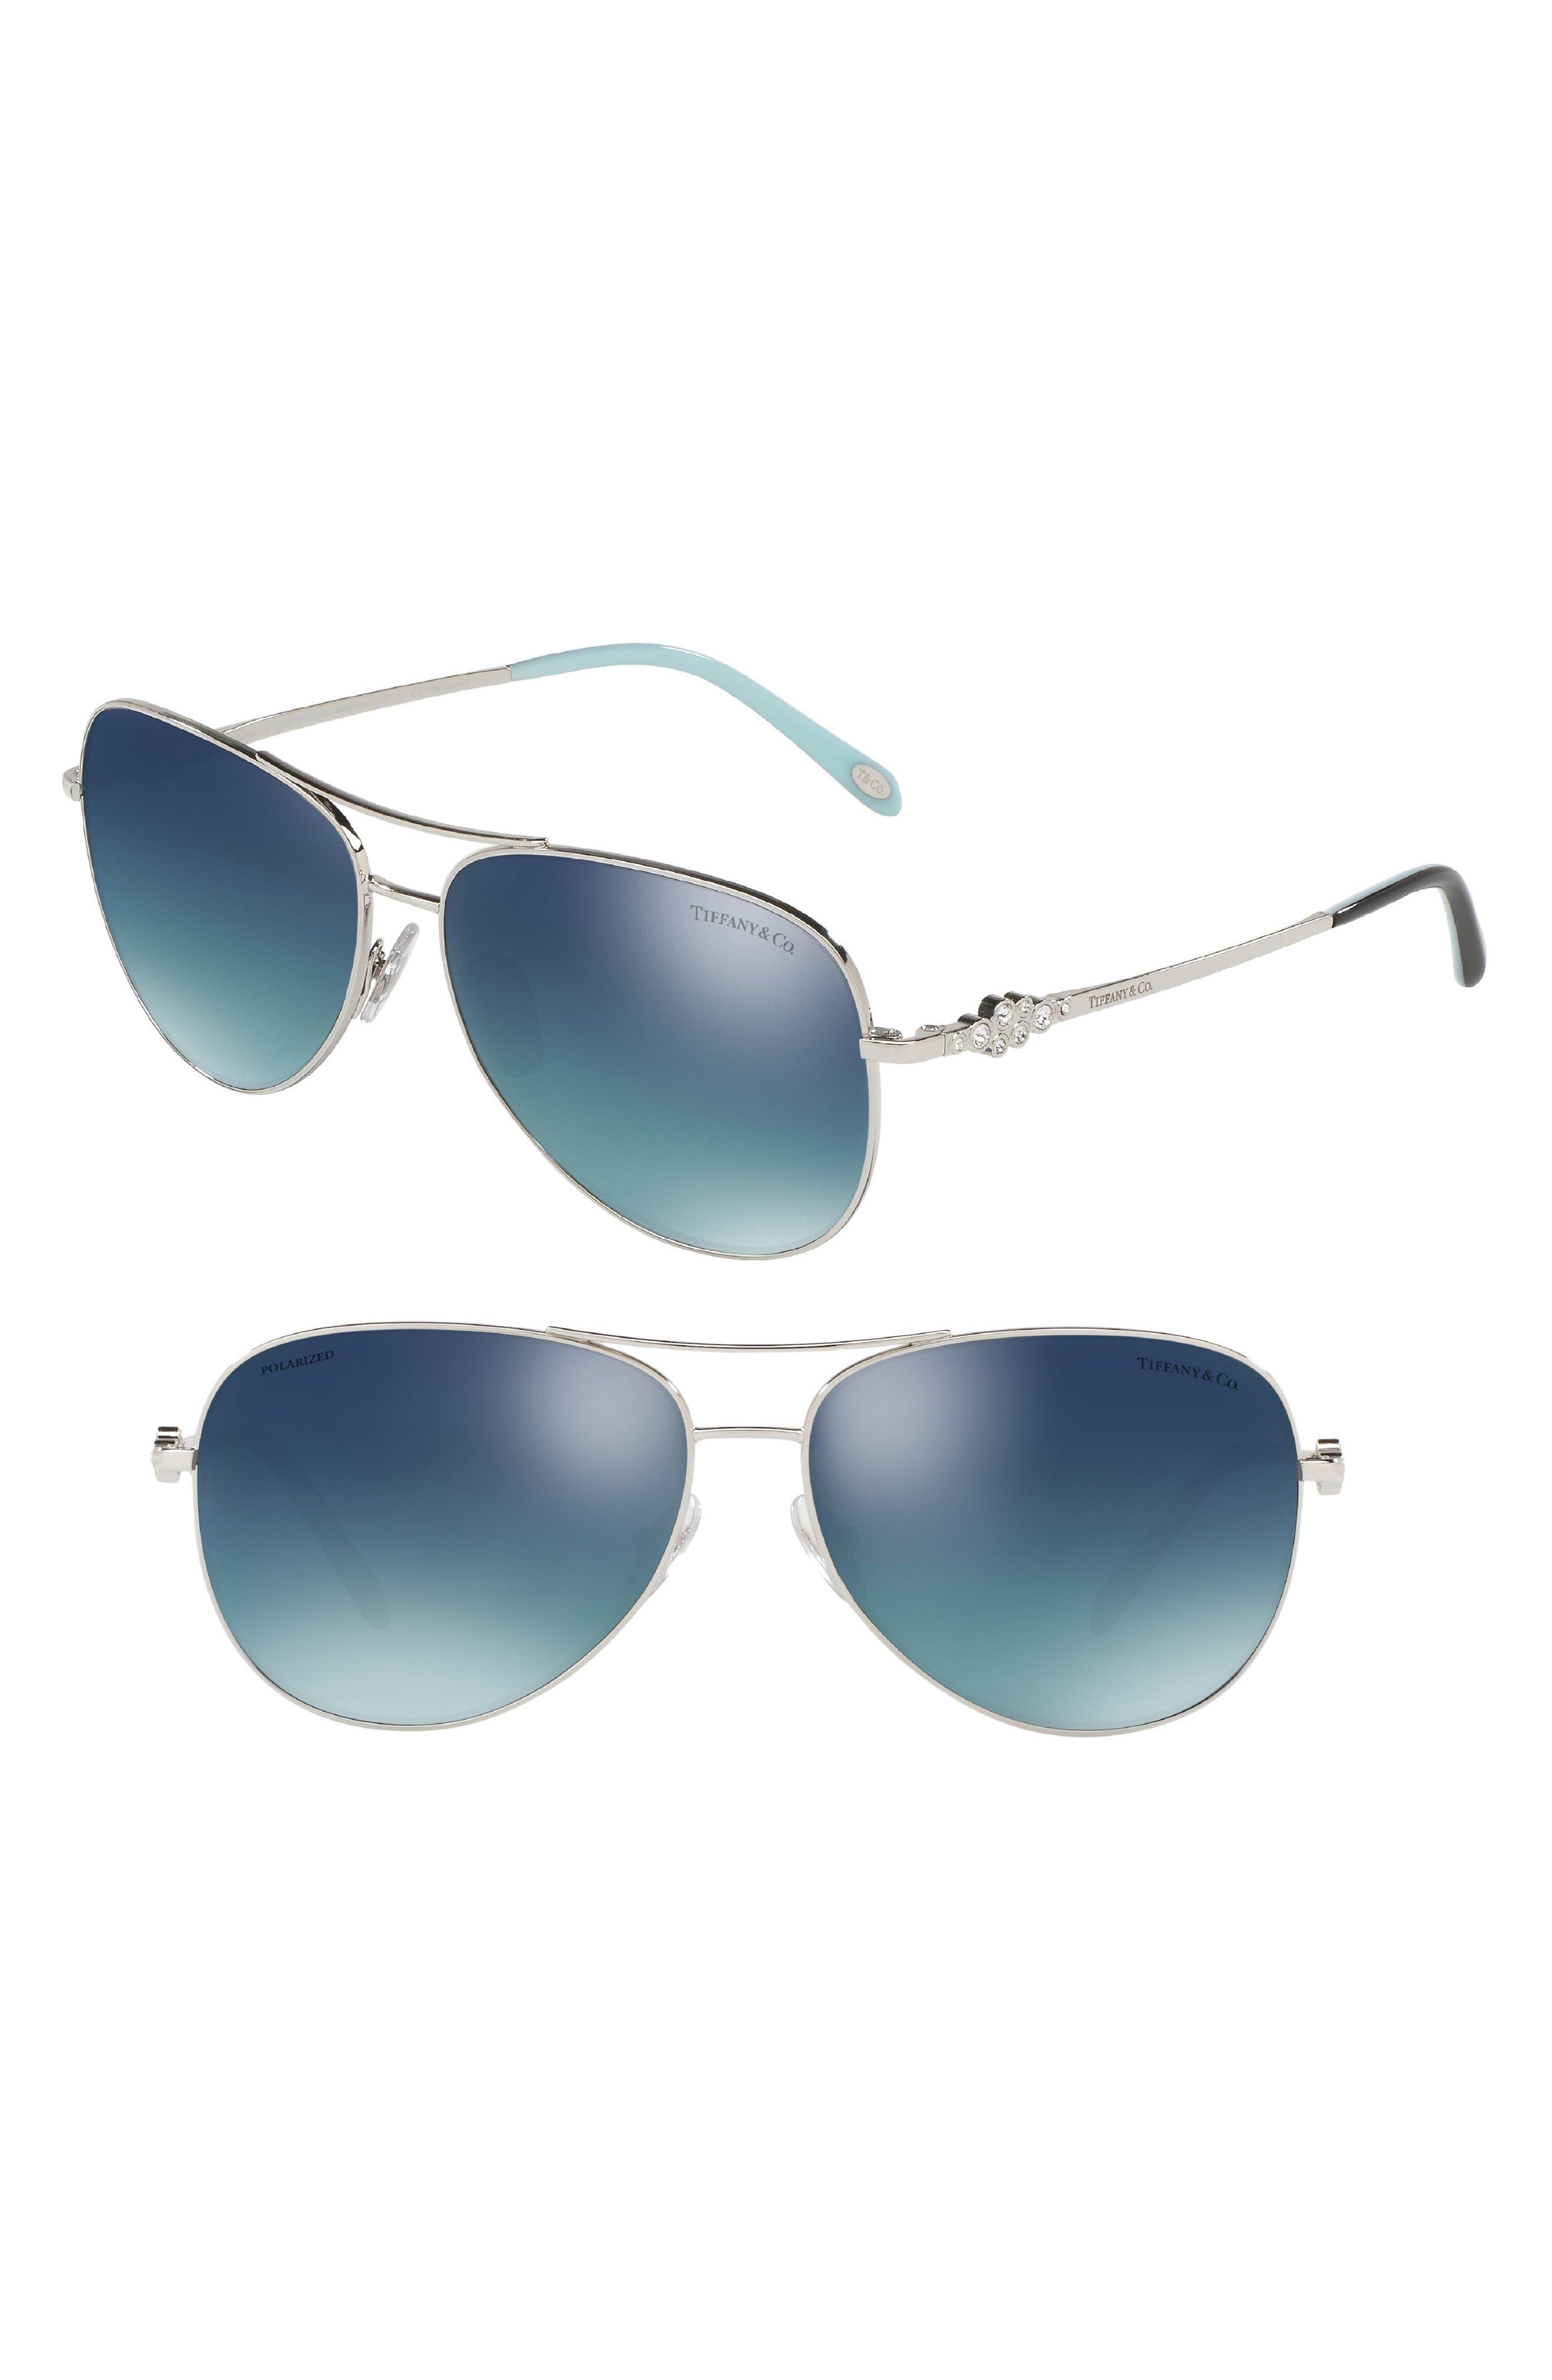 6c42d4109faa Women's Tiffany 59Mm Polarized Metal Aviator Sunglasses -